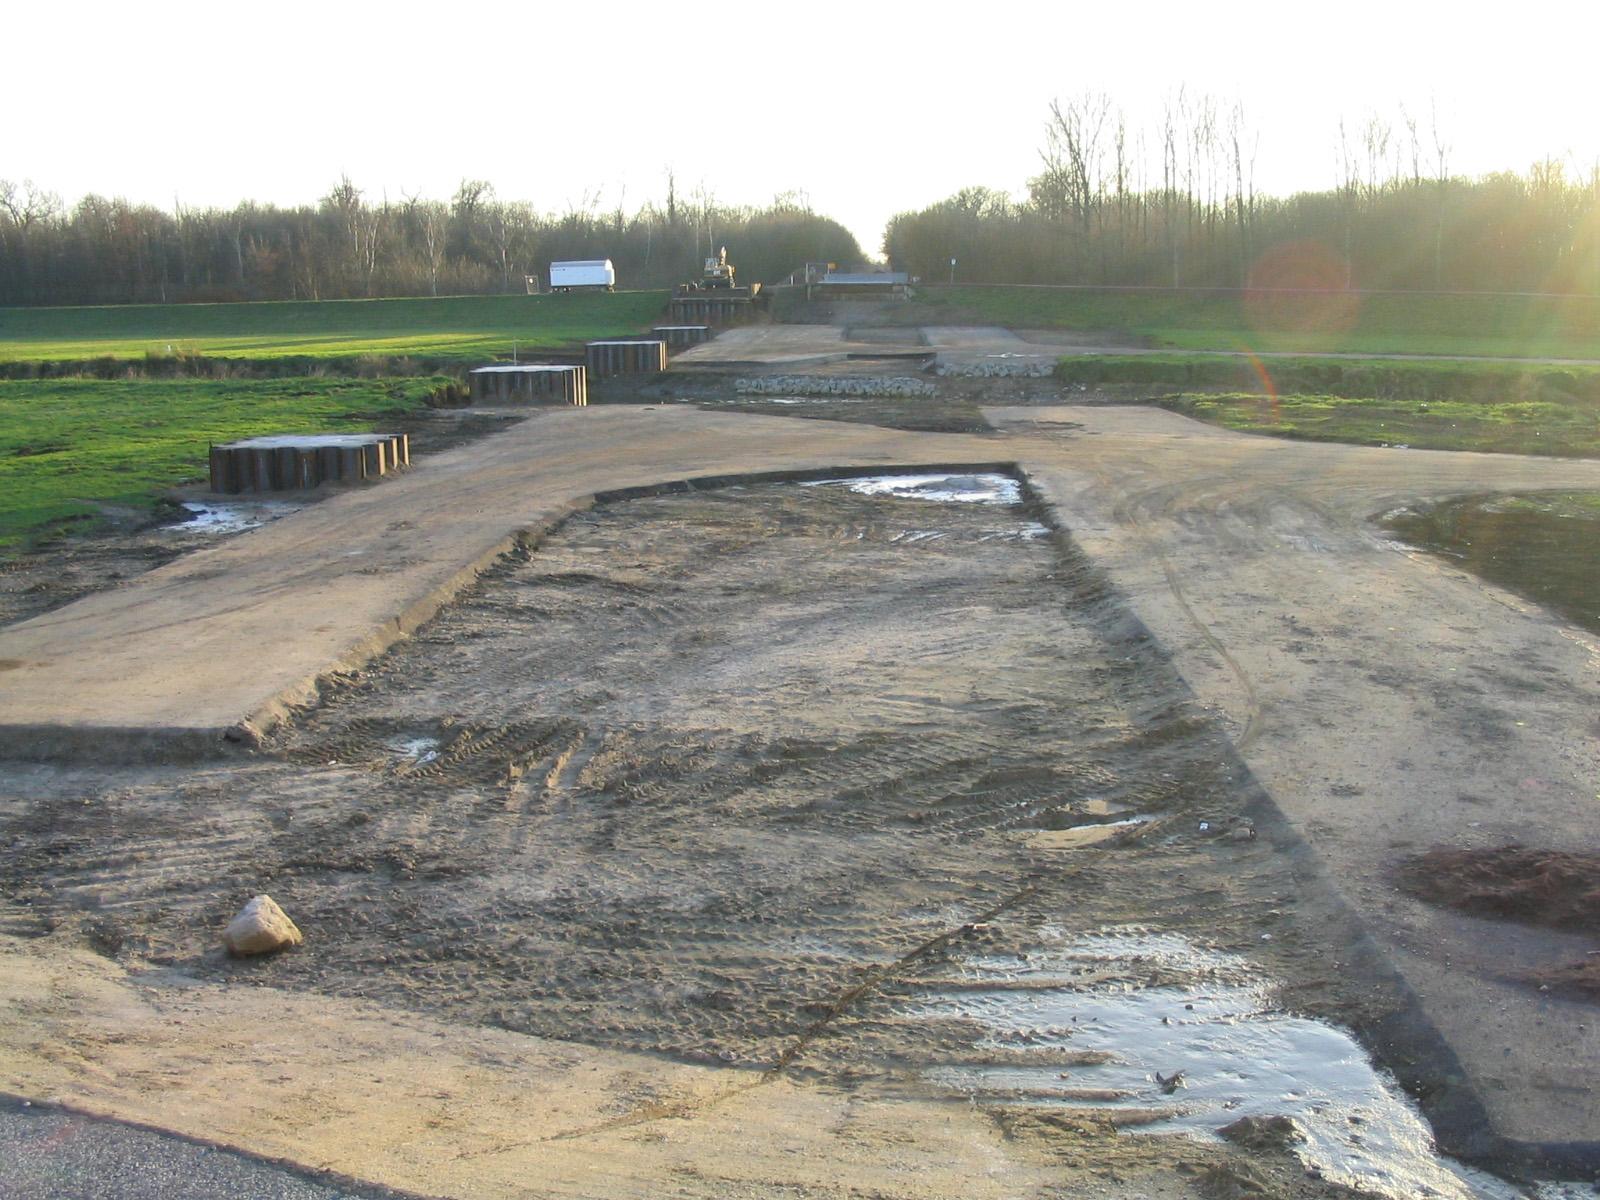 03.12.2006 - Neue Brücke im Bau